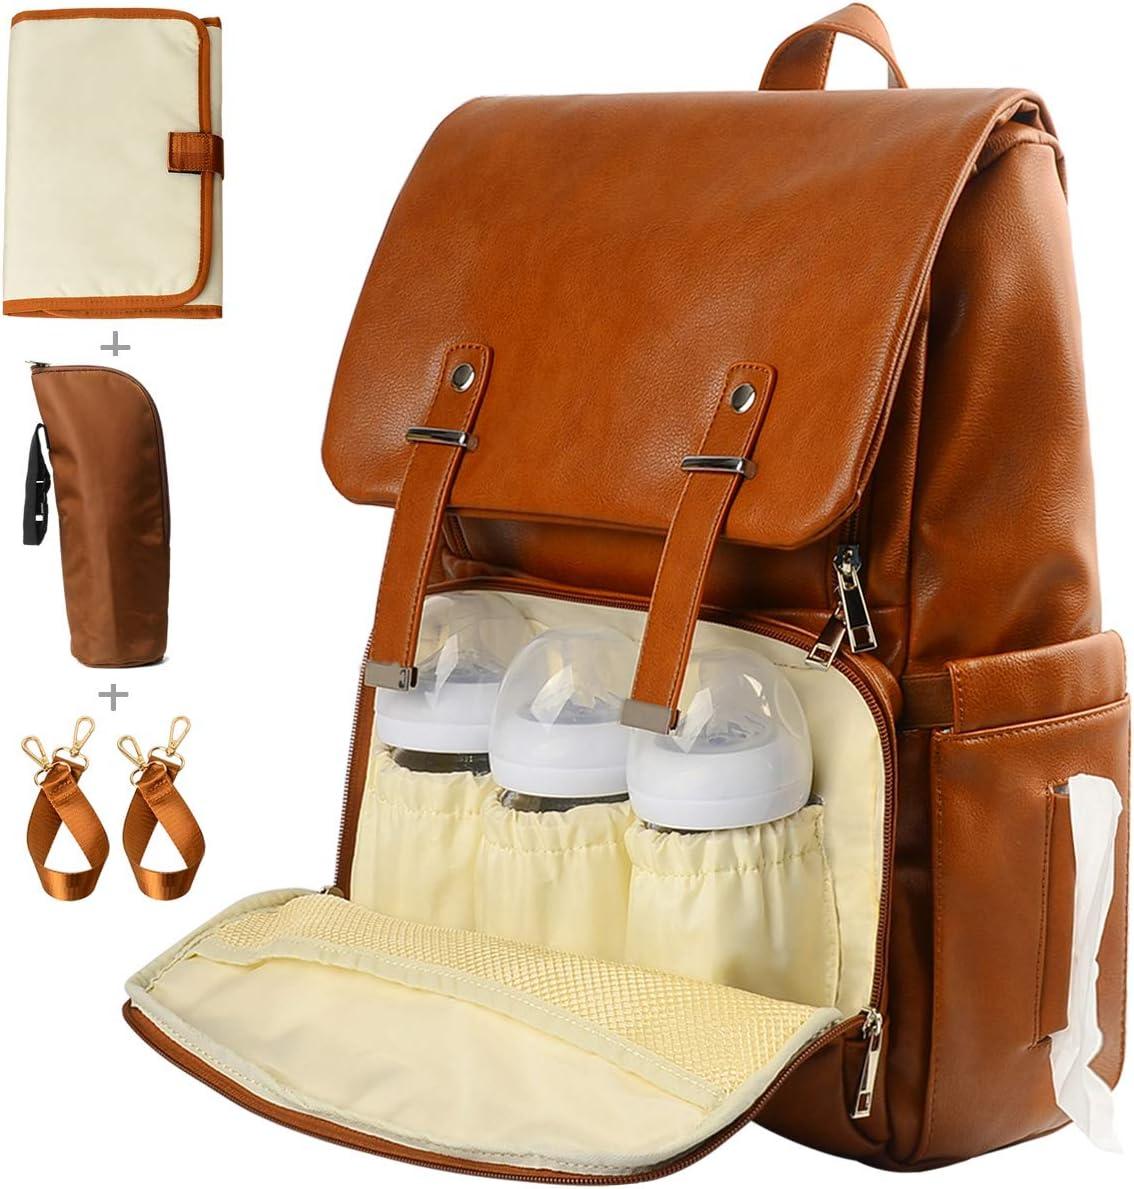 Leather Diaper Bag Backpack, Nappy Bag Baby Bags for Mom Unisex Maternity Diaper Bag with Stroller Hanger|Thermal Pockets|Adjustable Shoulder Straps|Water Proof| LargeCapacity (Brown)